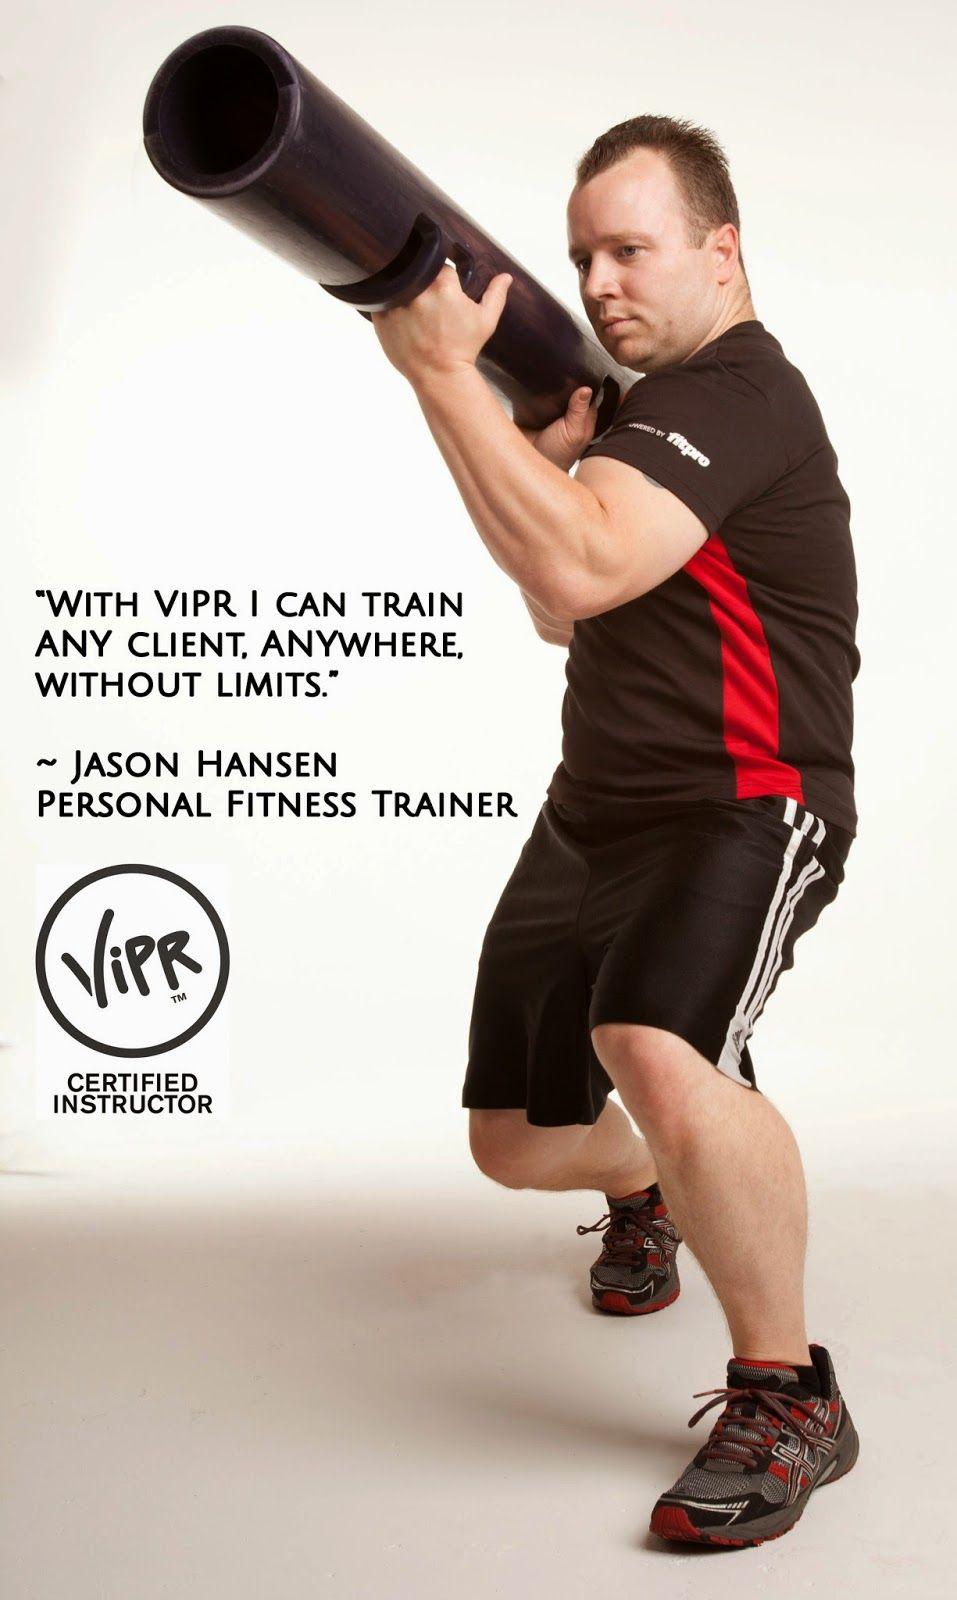 Santa Rosa Mobile Fitness Why I Use Vipr Blog Vipr Fitness Personal Fitness Trainer Fitness Blog Fitness Marketing